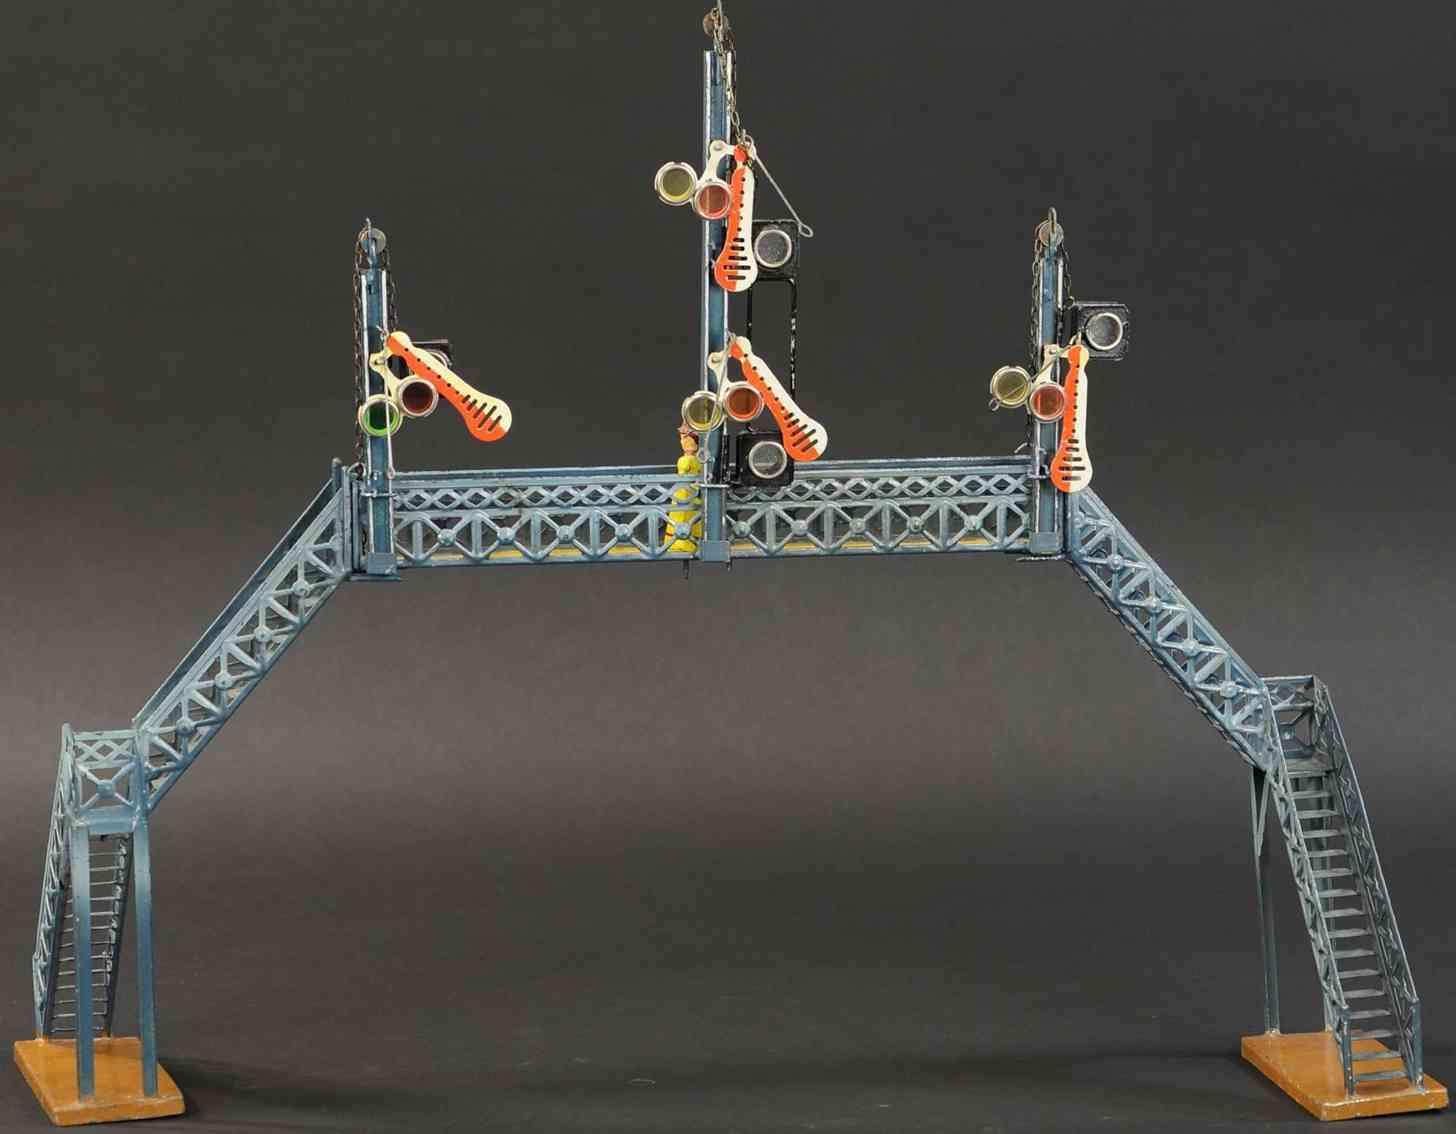 marklin maerklin 2394/1 railway toy gangway signal bridge